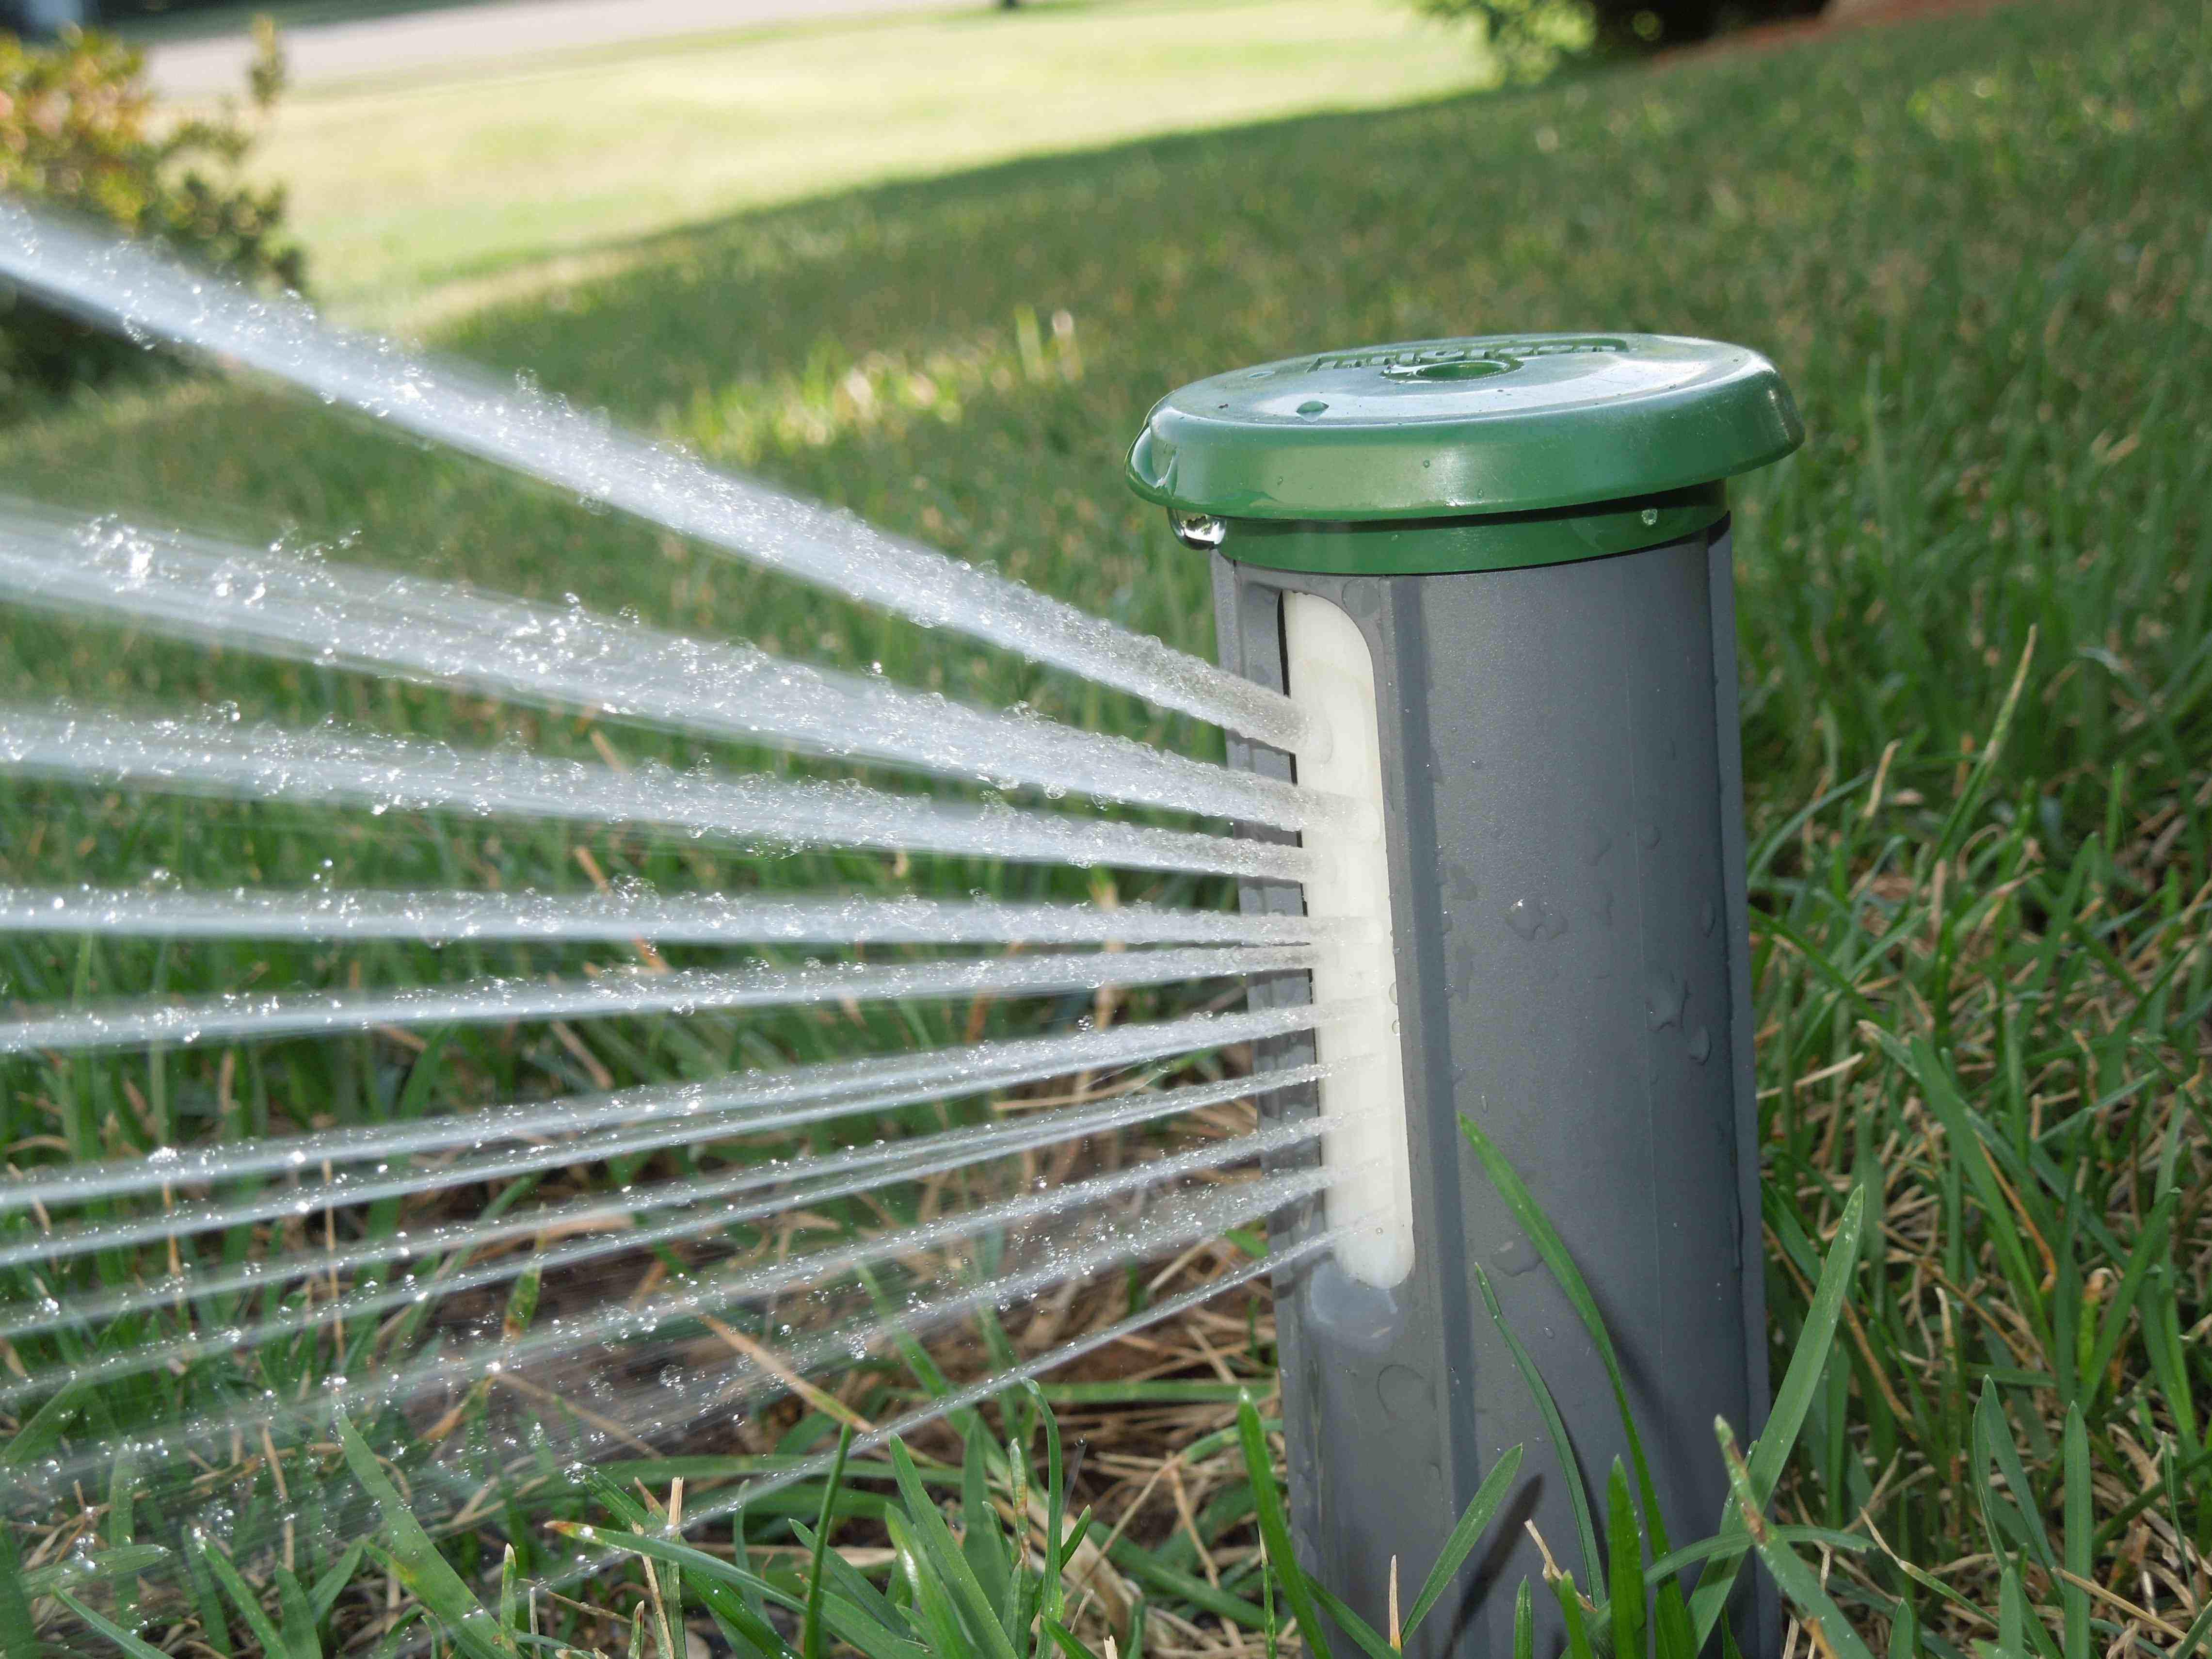 East coast distributor adds irrigreens irrigation system irrigreen genius sprinkler geenschuldenfo Choice Image